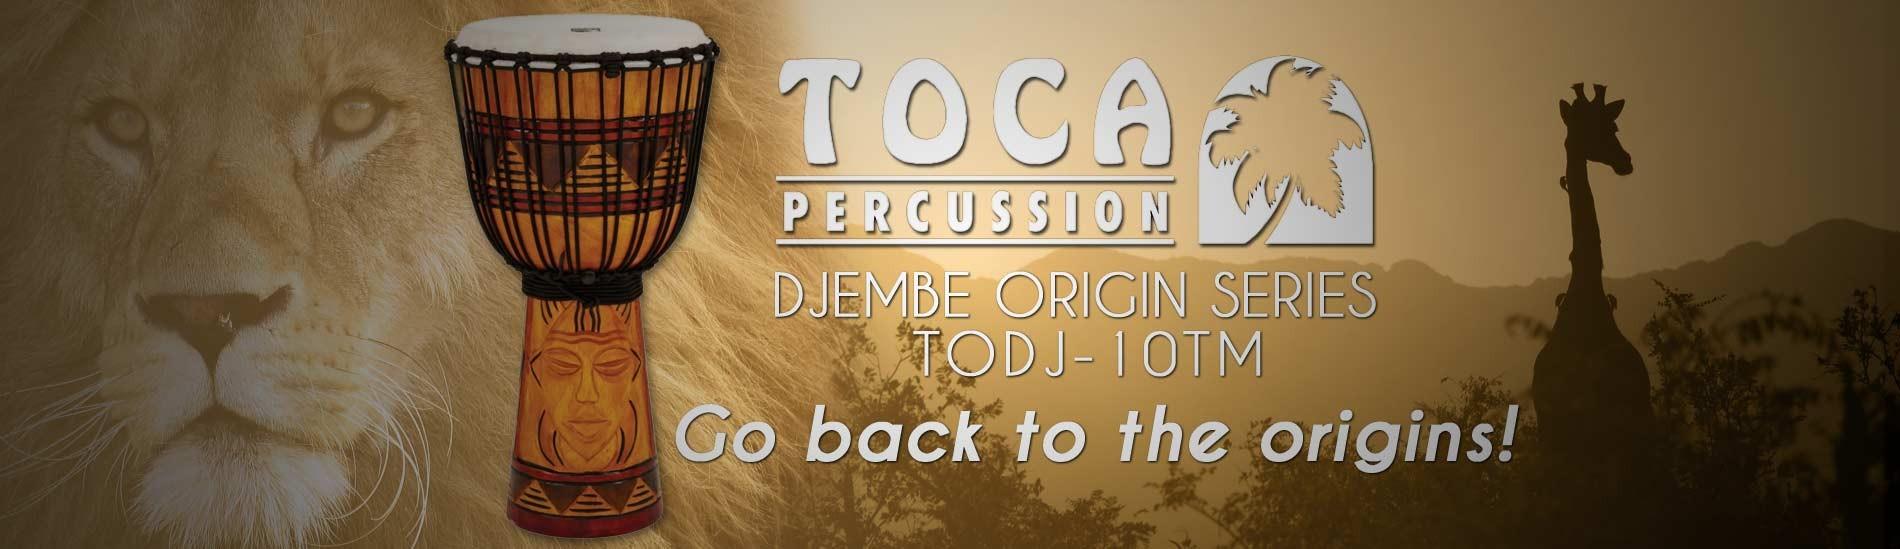 Toca Percussion Djembe TODJ-10TM Origin Series